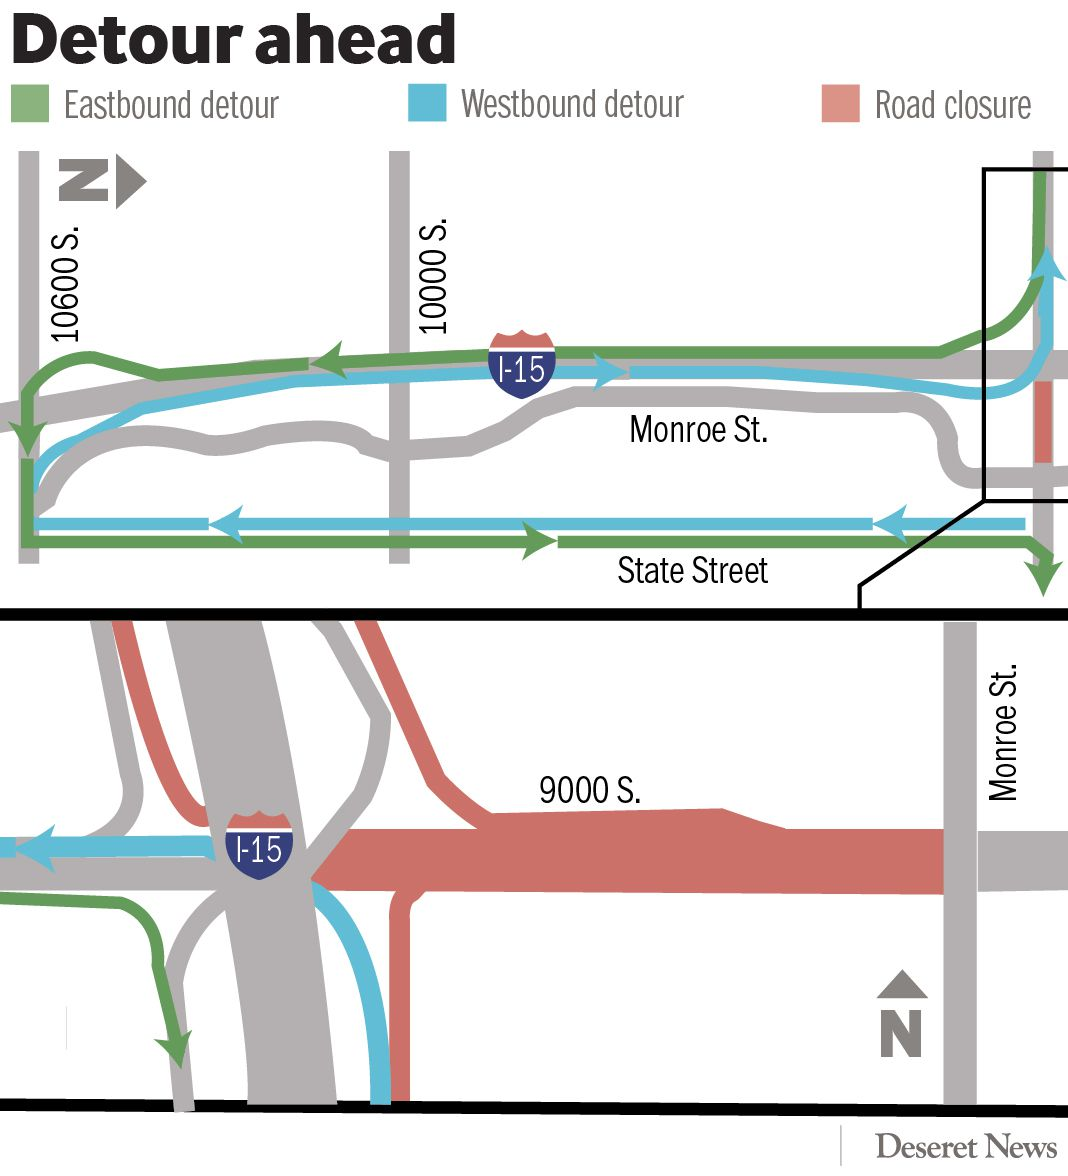 Detour ahead: I-15 briefing